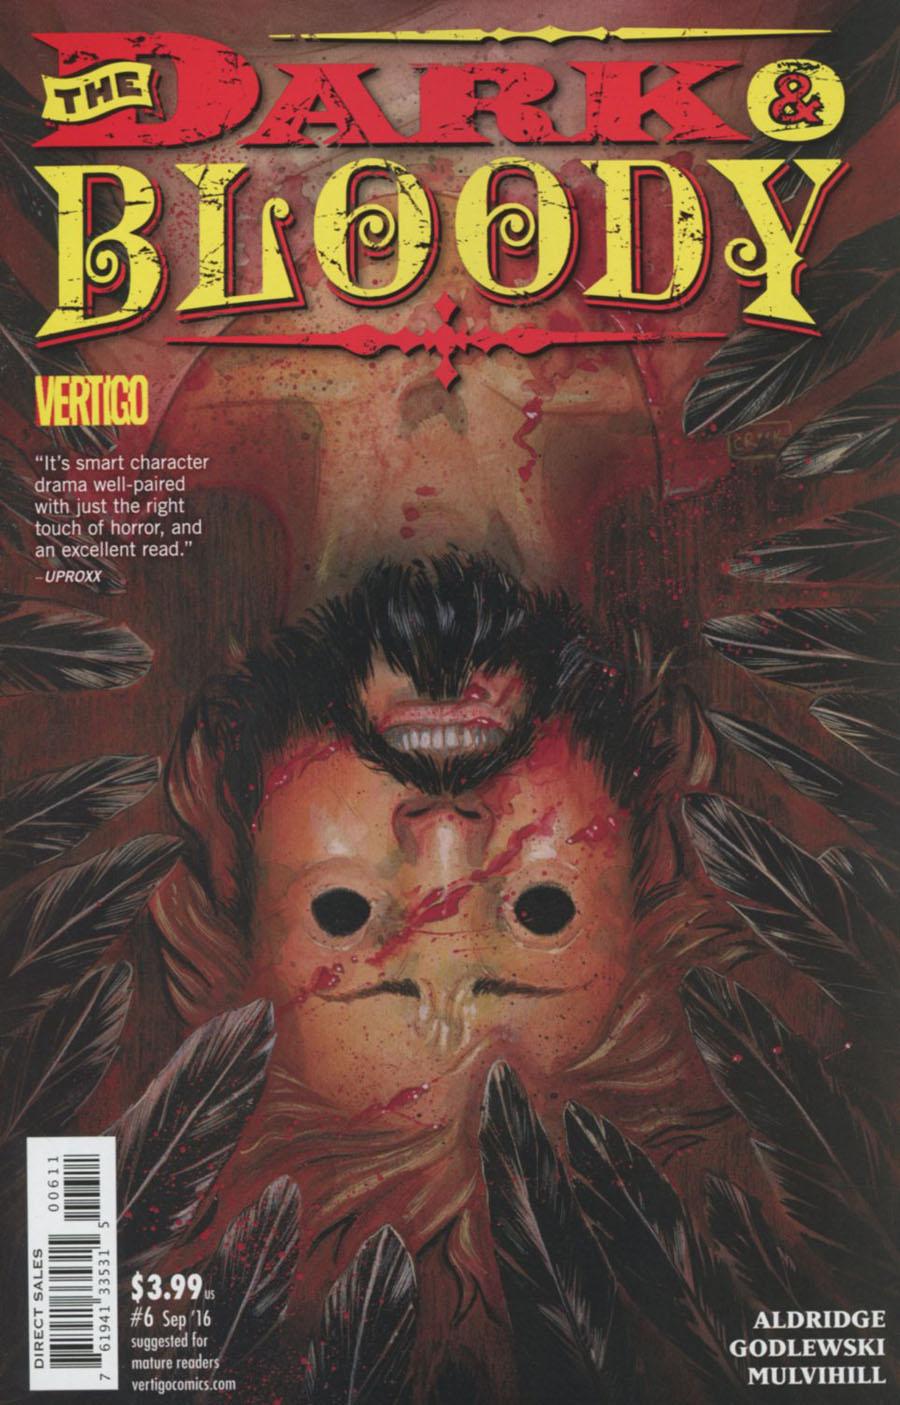 Dark And Bloody #6